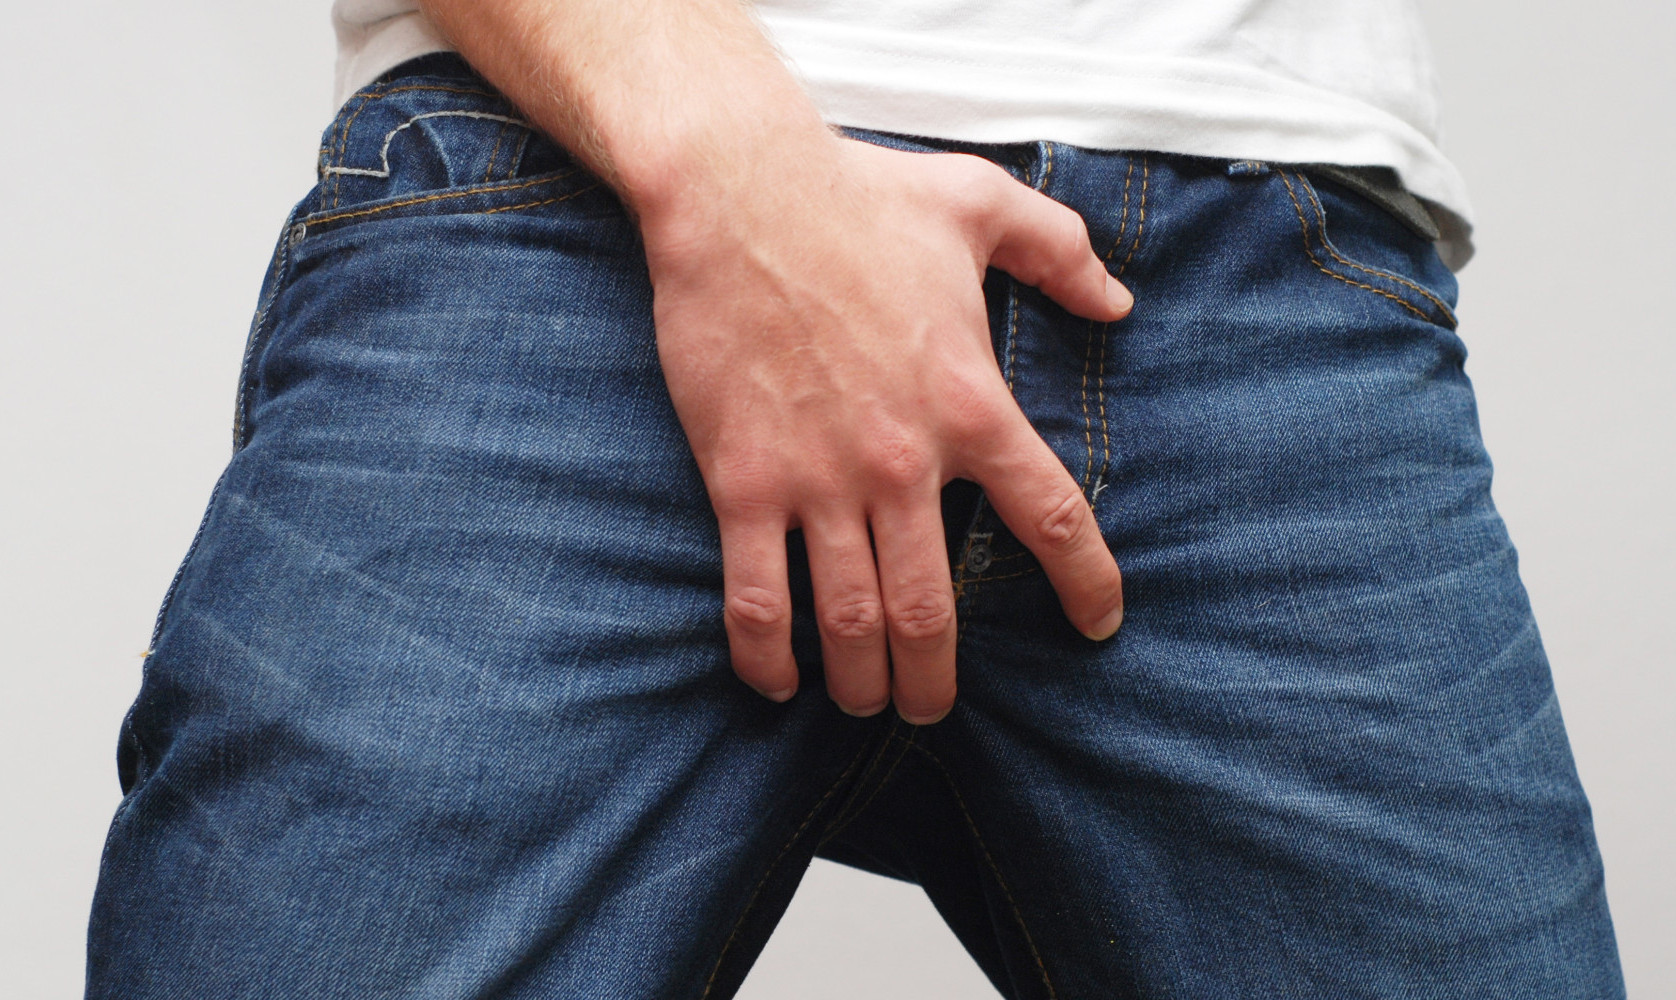 Man scratching crotch